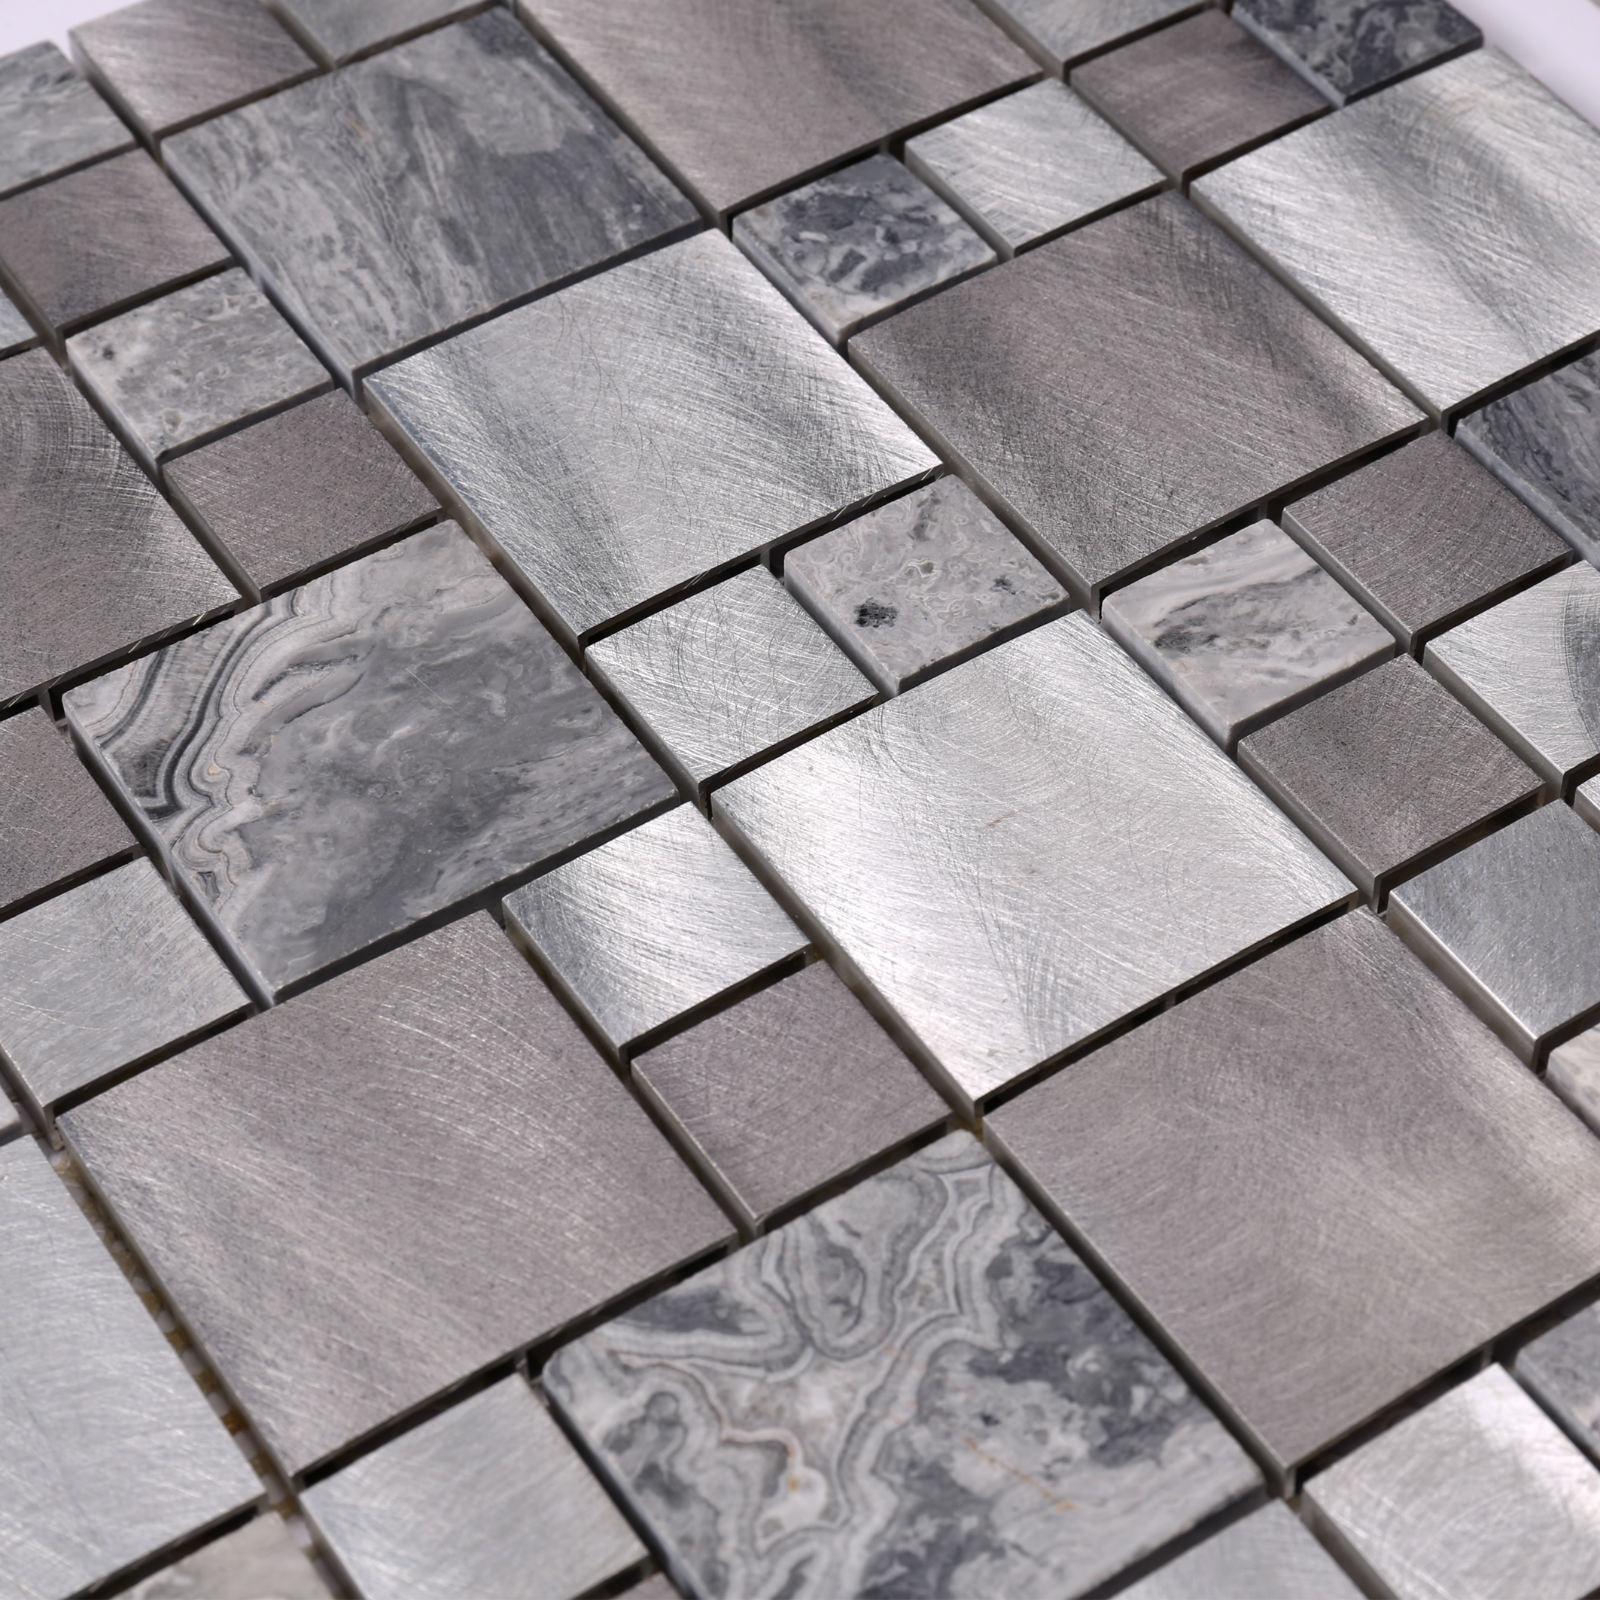 news-Heng Xing aluminum metal wall tiles manufacturer for bathroom-Heng Xing-img